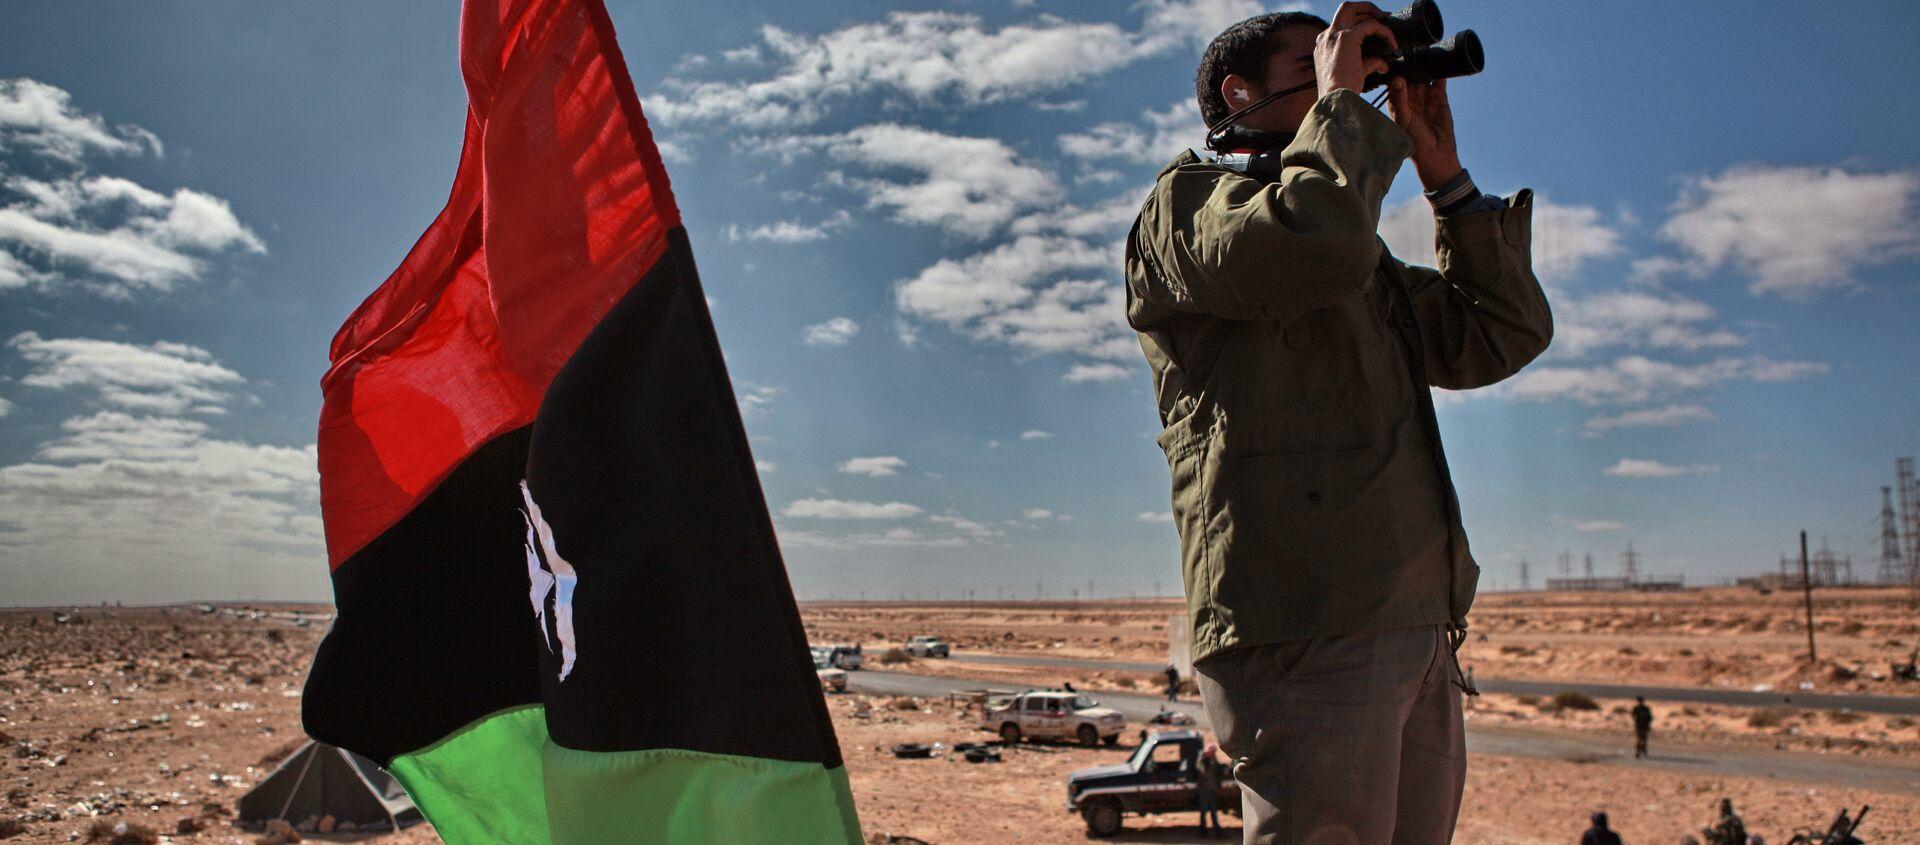 Un militante libico - Sputnik Italia, 1920, 31.03.2016